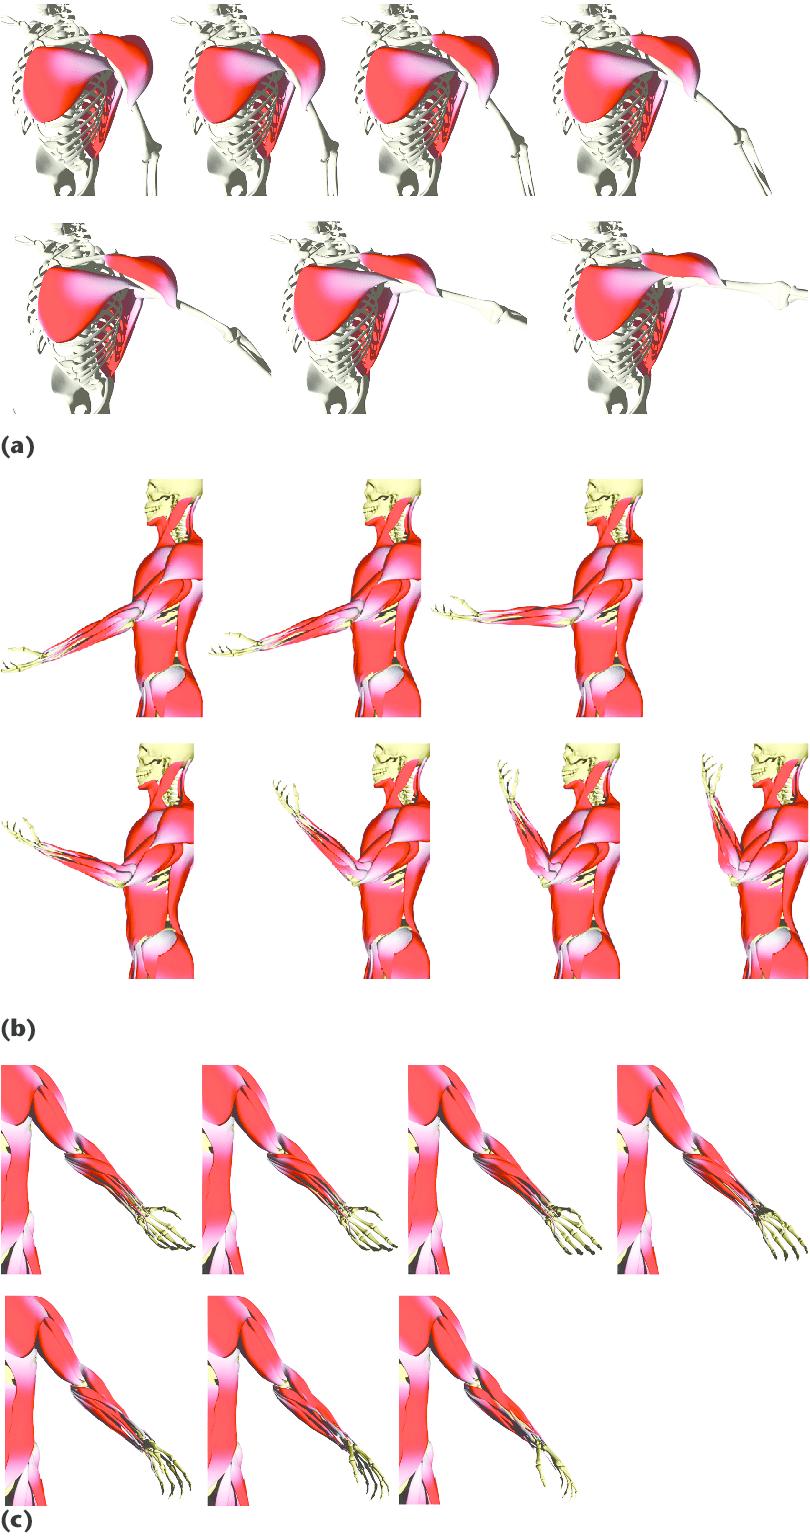 medium resolution of muscle deformation illustrations a pectoralis major deltoid and latissimus dorsi